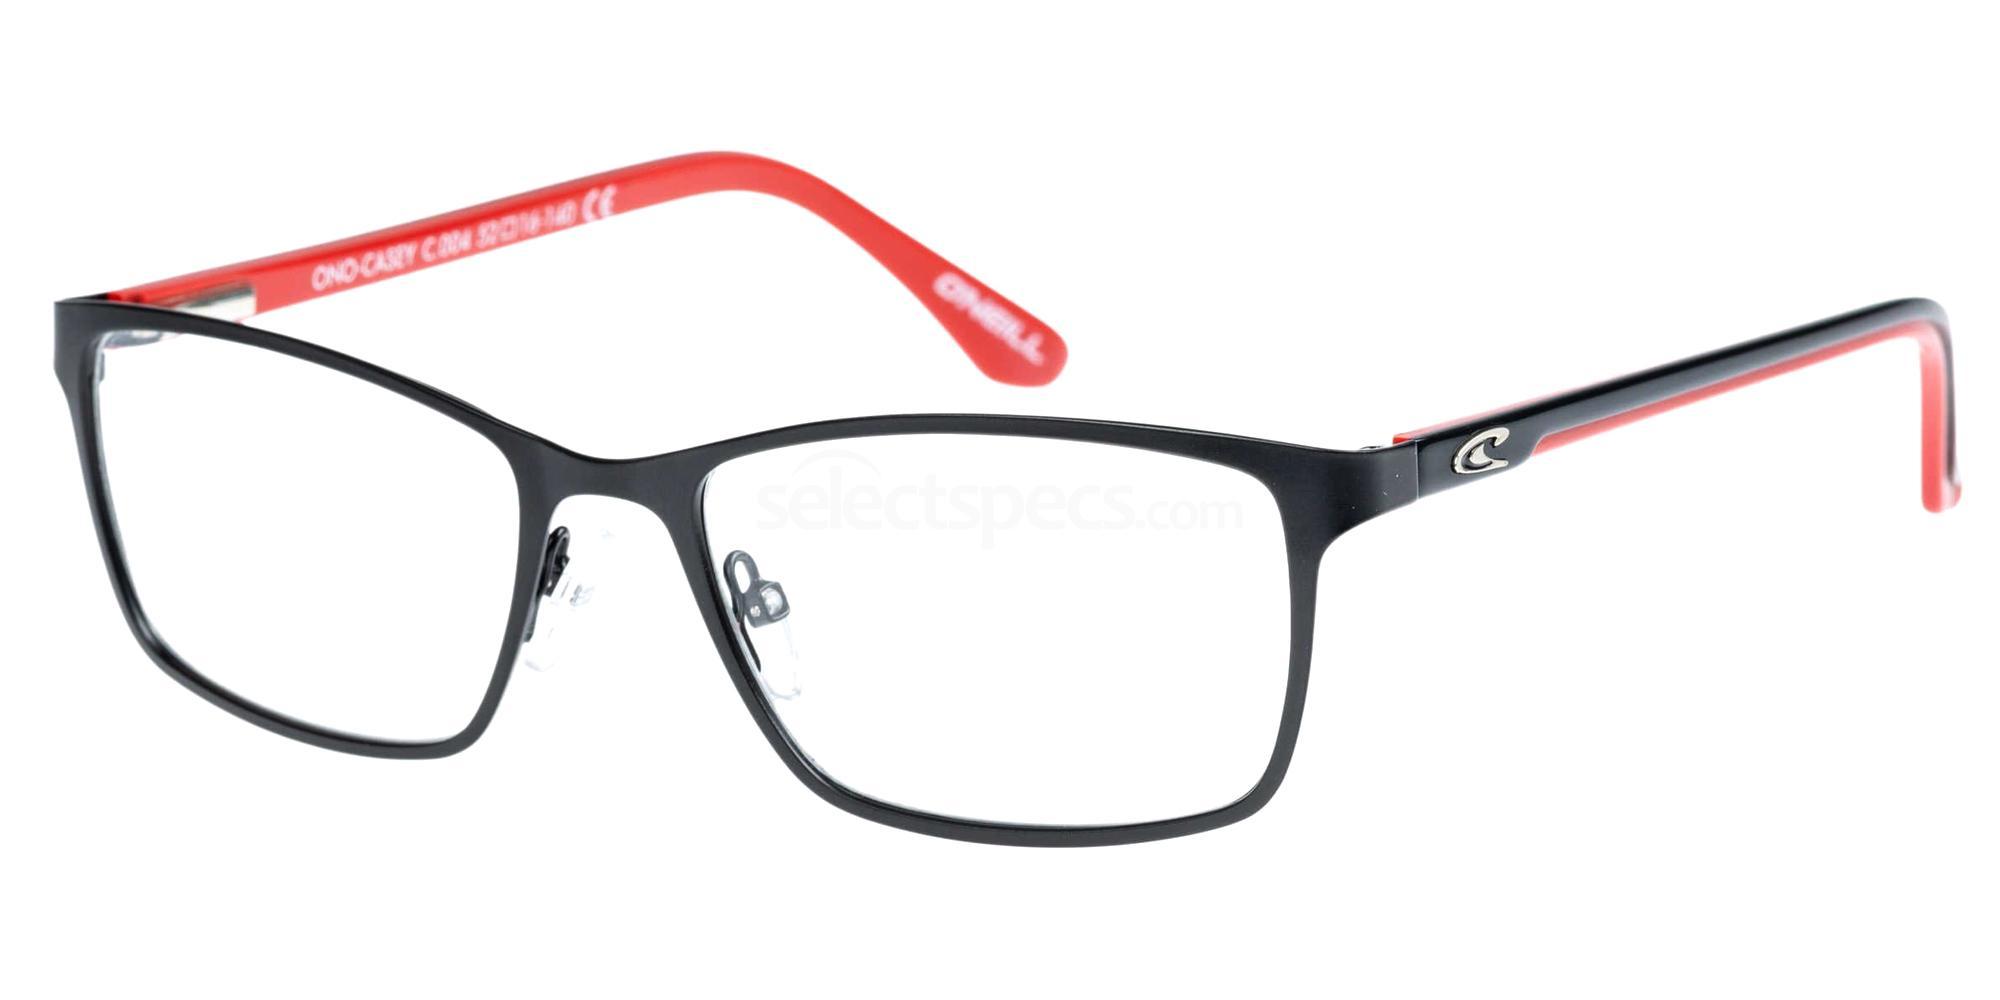 004 ONO-CASEY Glasses, O'Neill